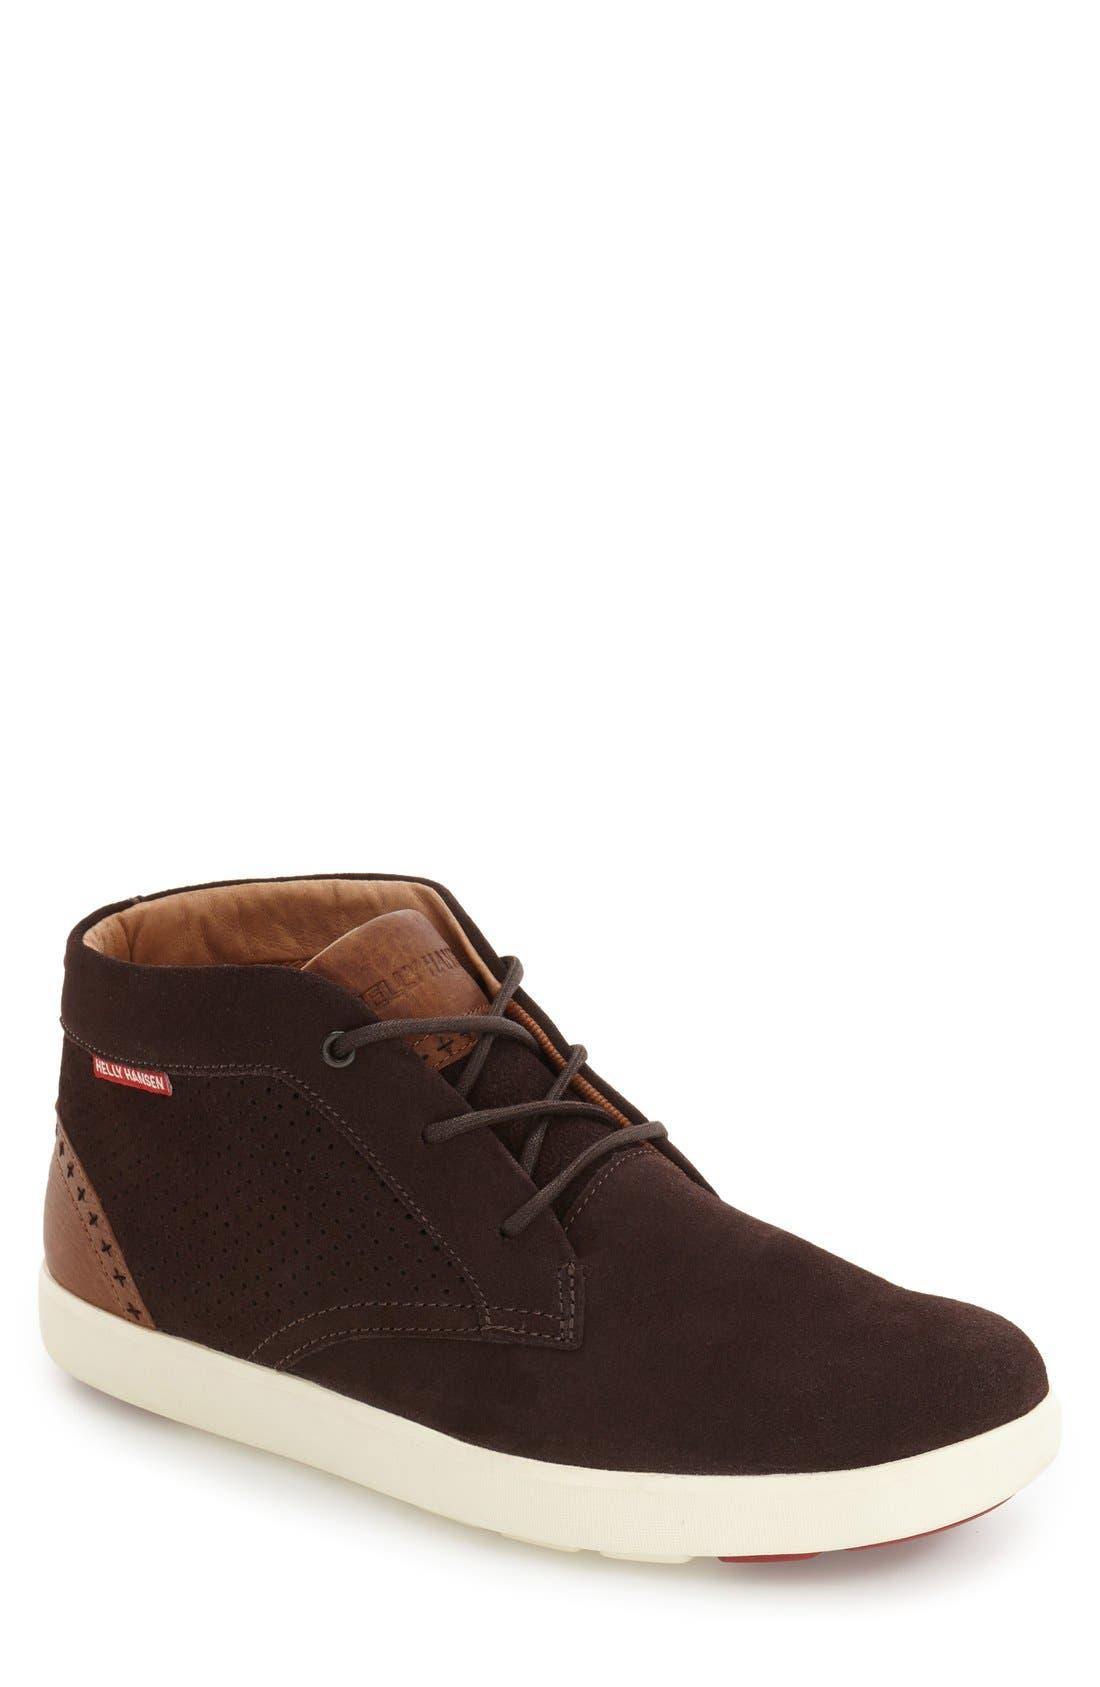 Alternate Image 1 Selected - Helly Hansen 'Vigeland' Sneaker (Men)